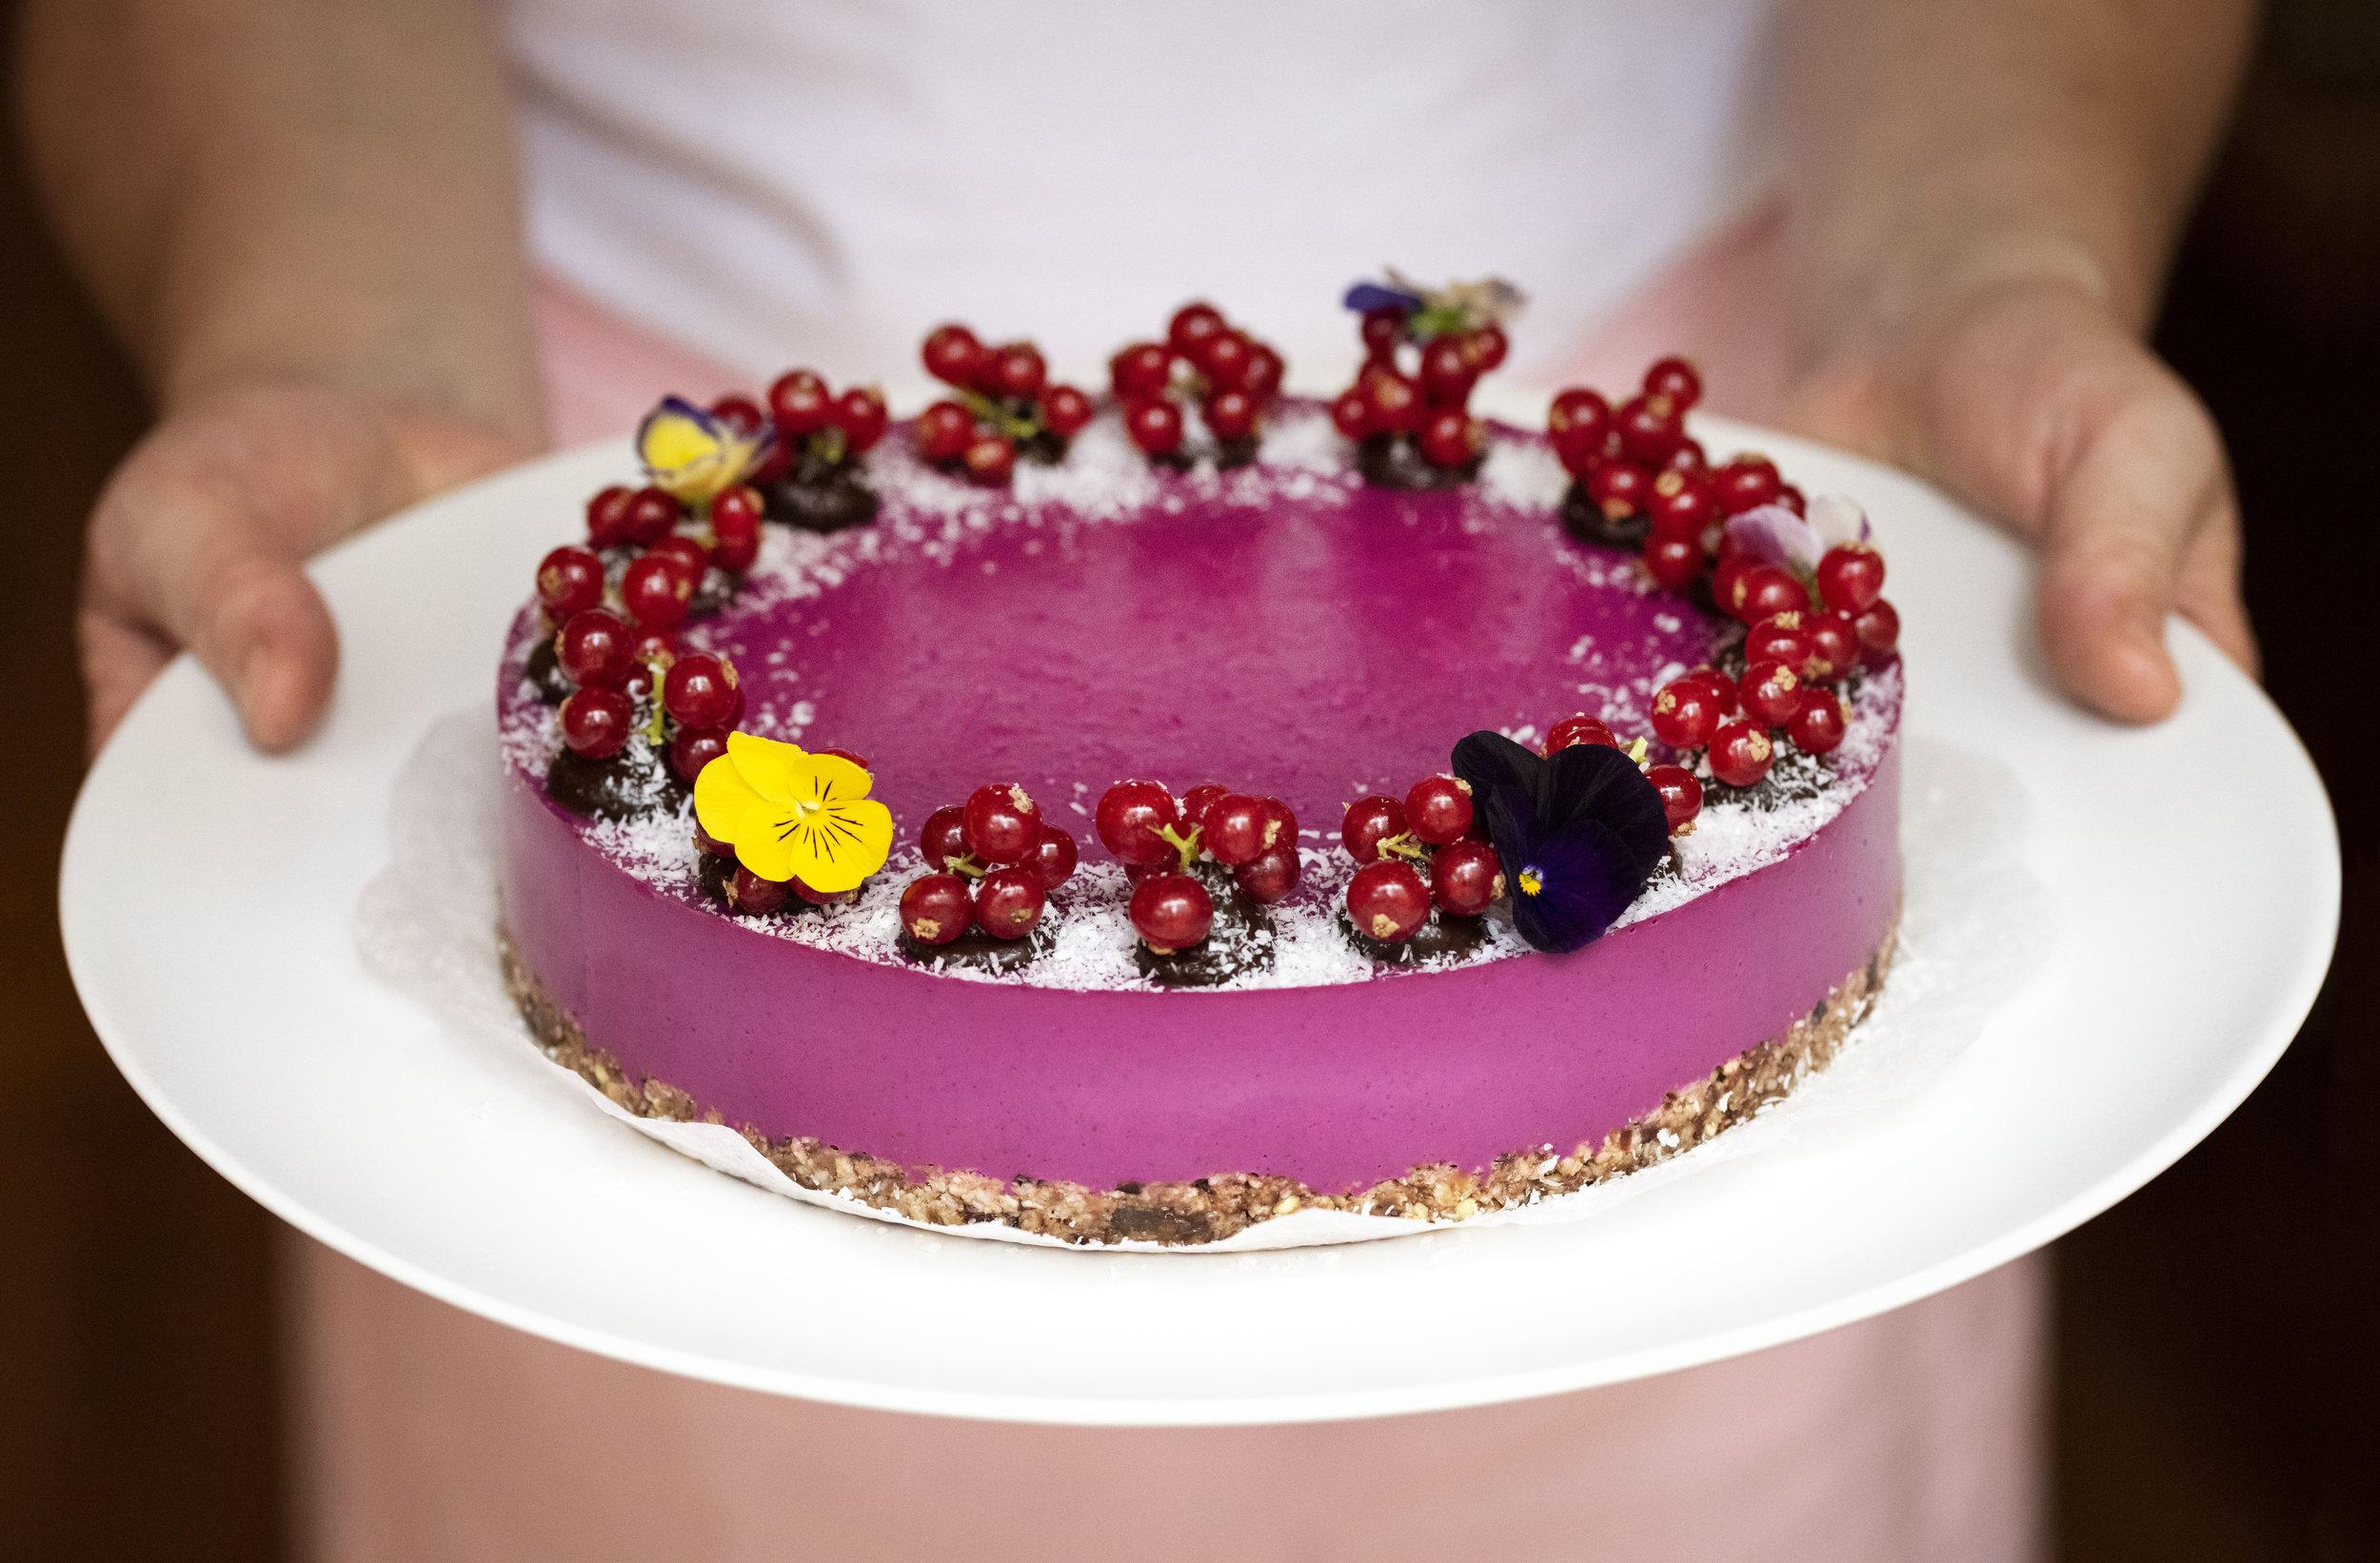 Cake at Wild Lulita, Barcelona. Photo © Barcelona Food Experience.